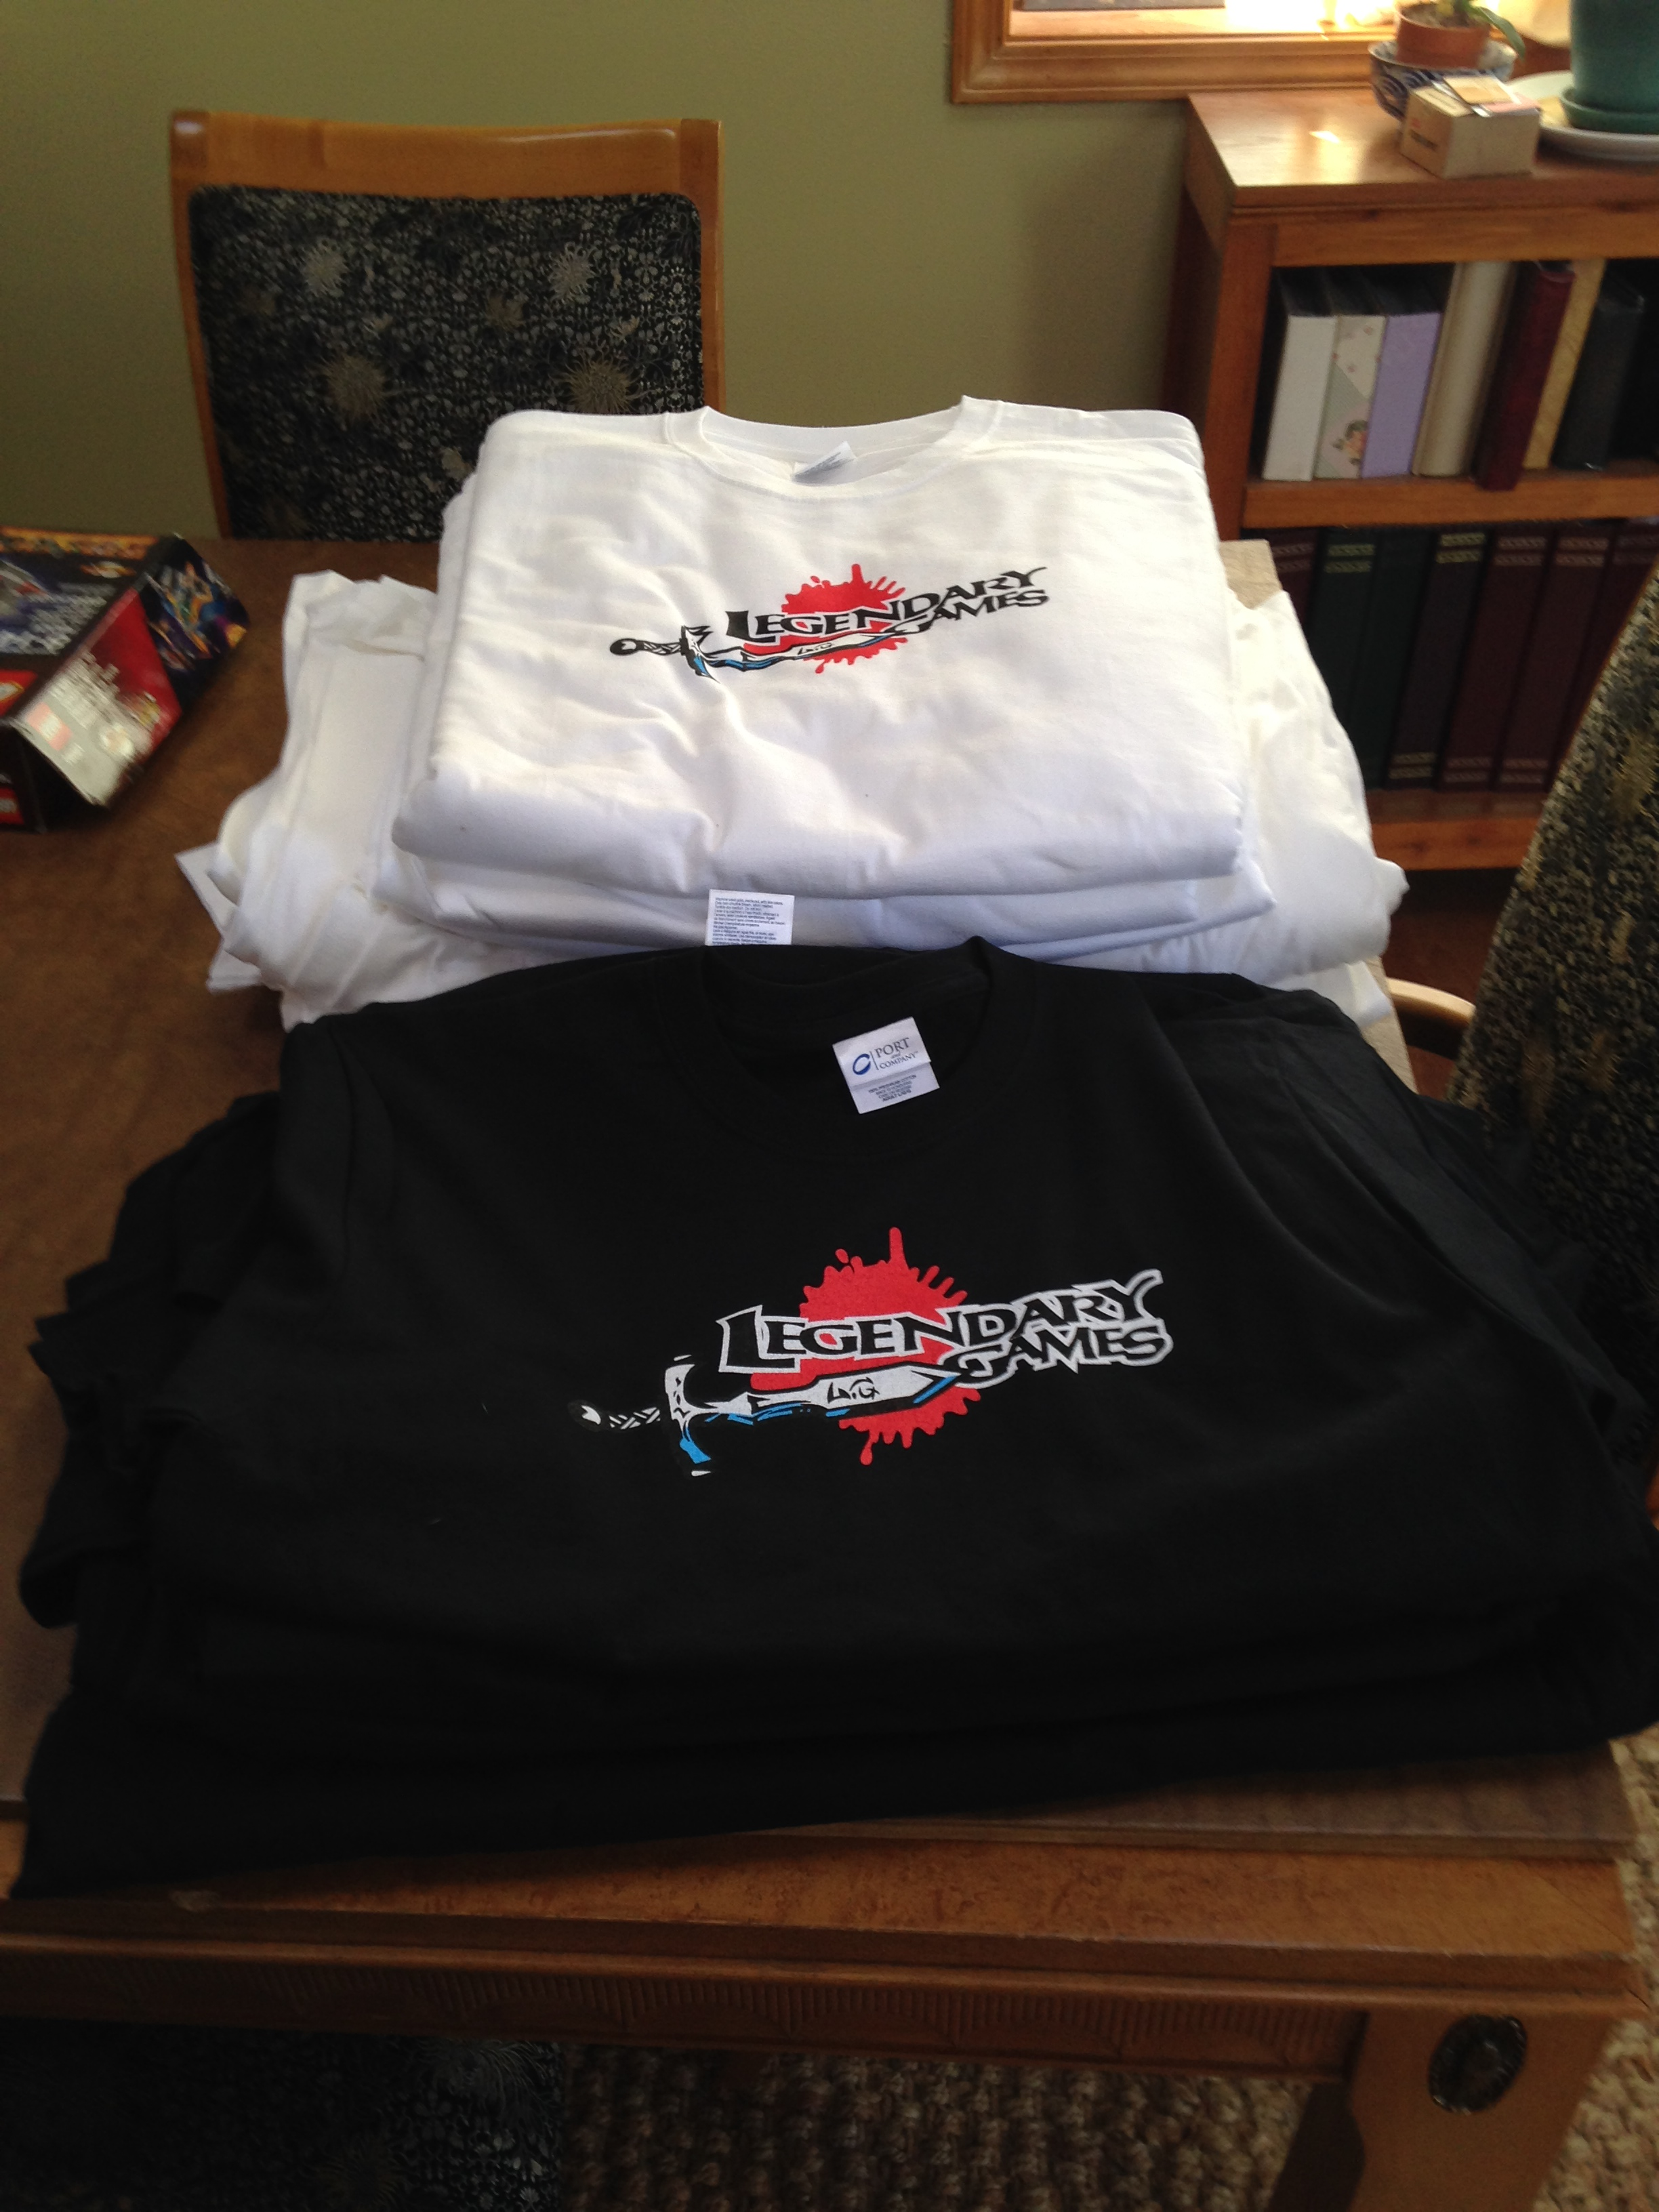 makeyourgamelegendary.com - t-shirts